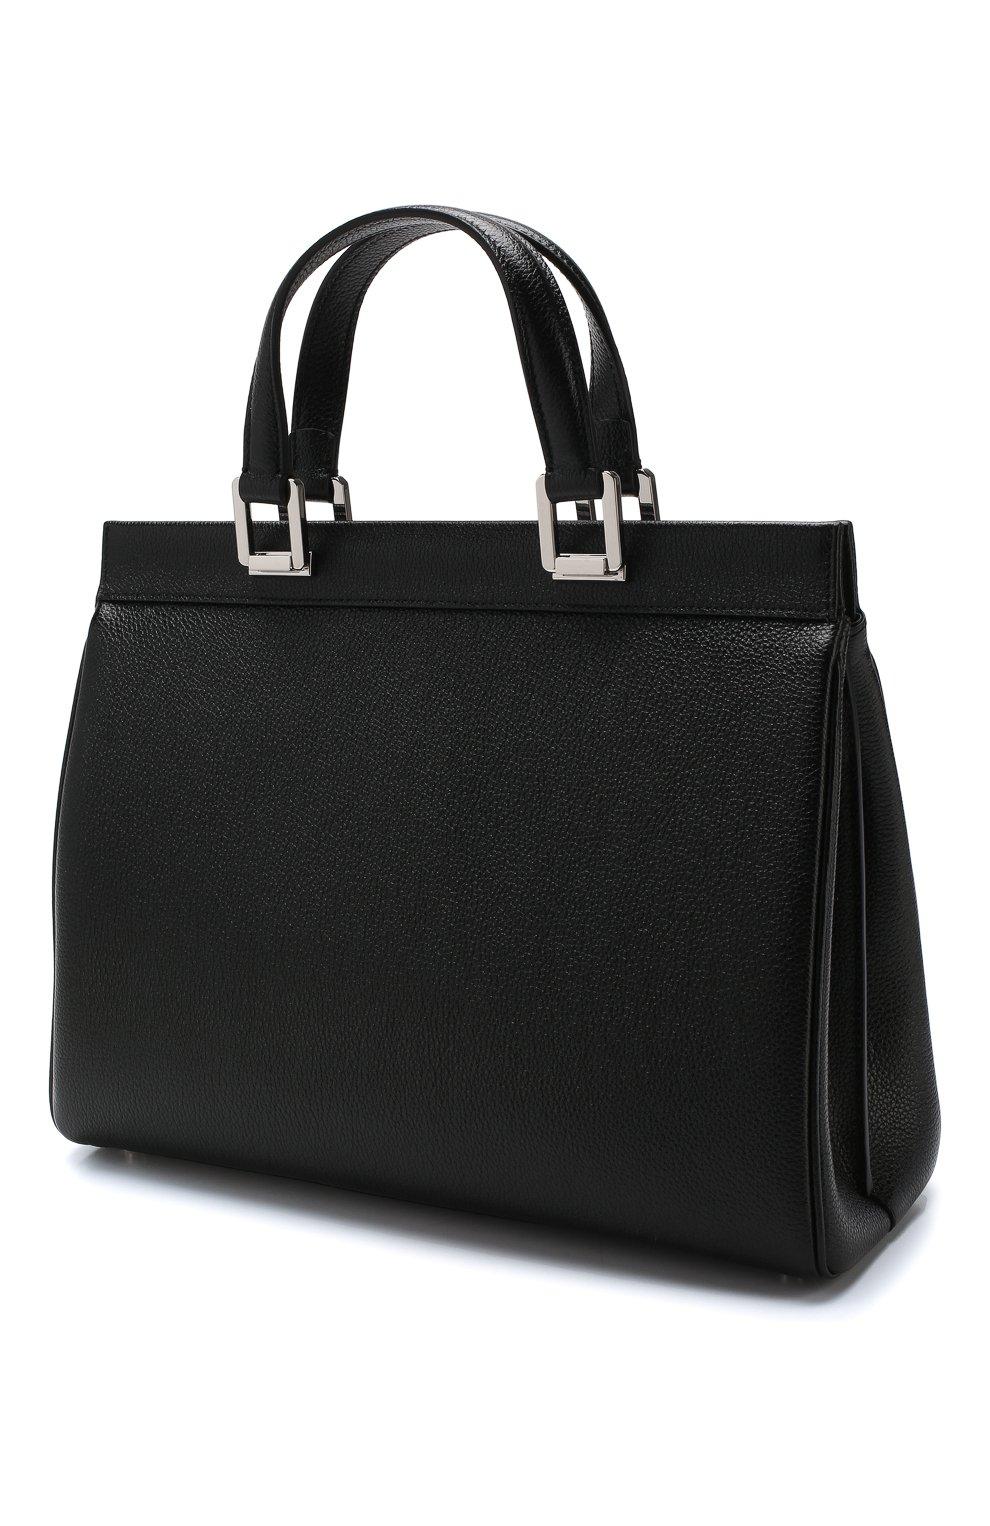 d2155b76bac5 Сумки Gucci по цене от 49 950 руб. купить в интернет-магазине ЦУМ